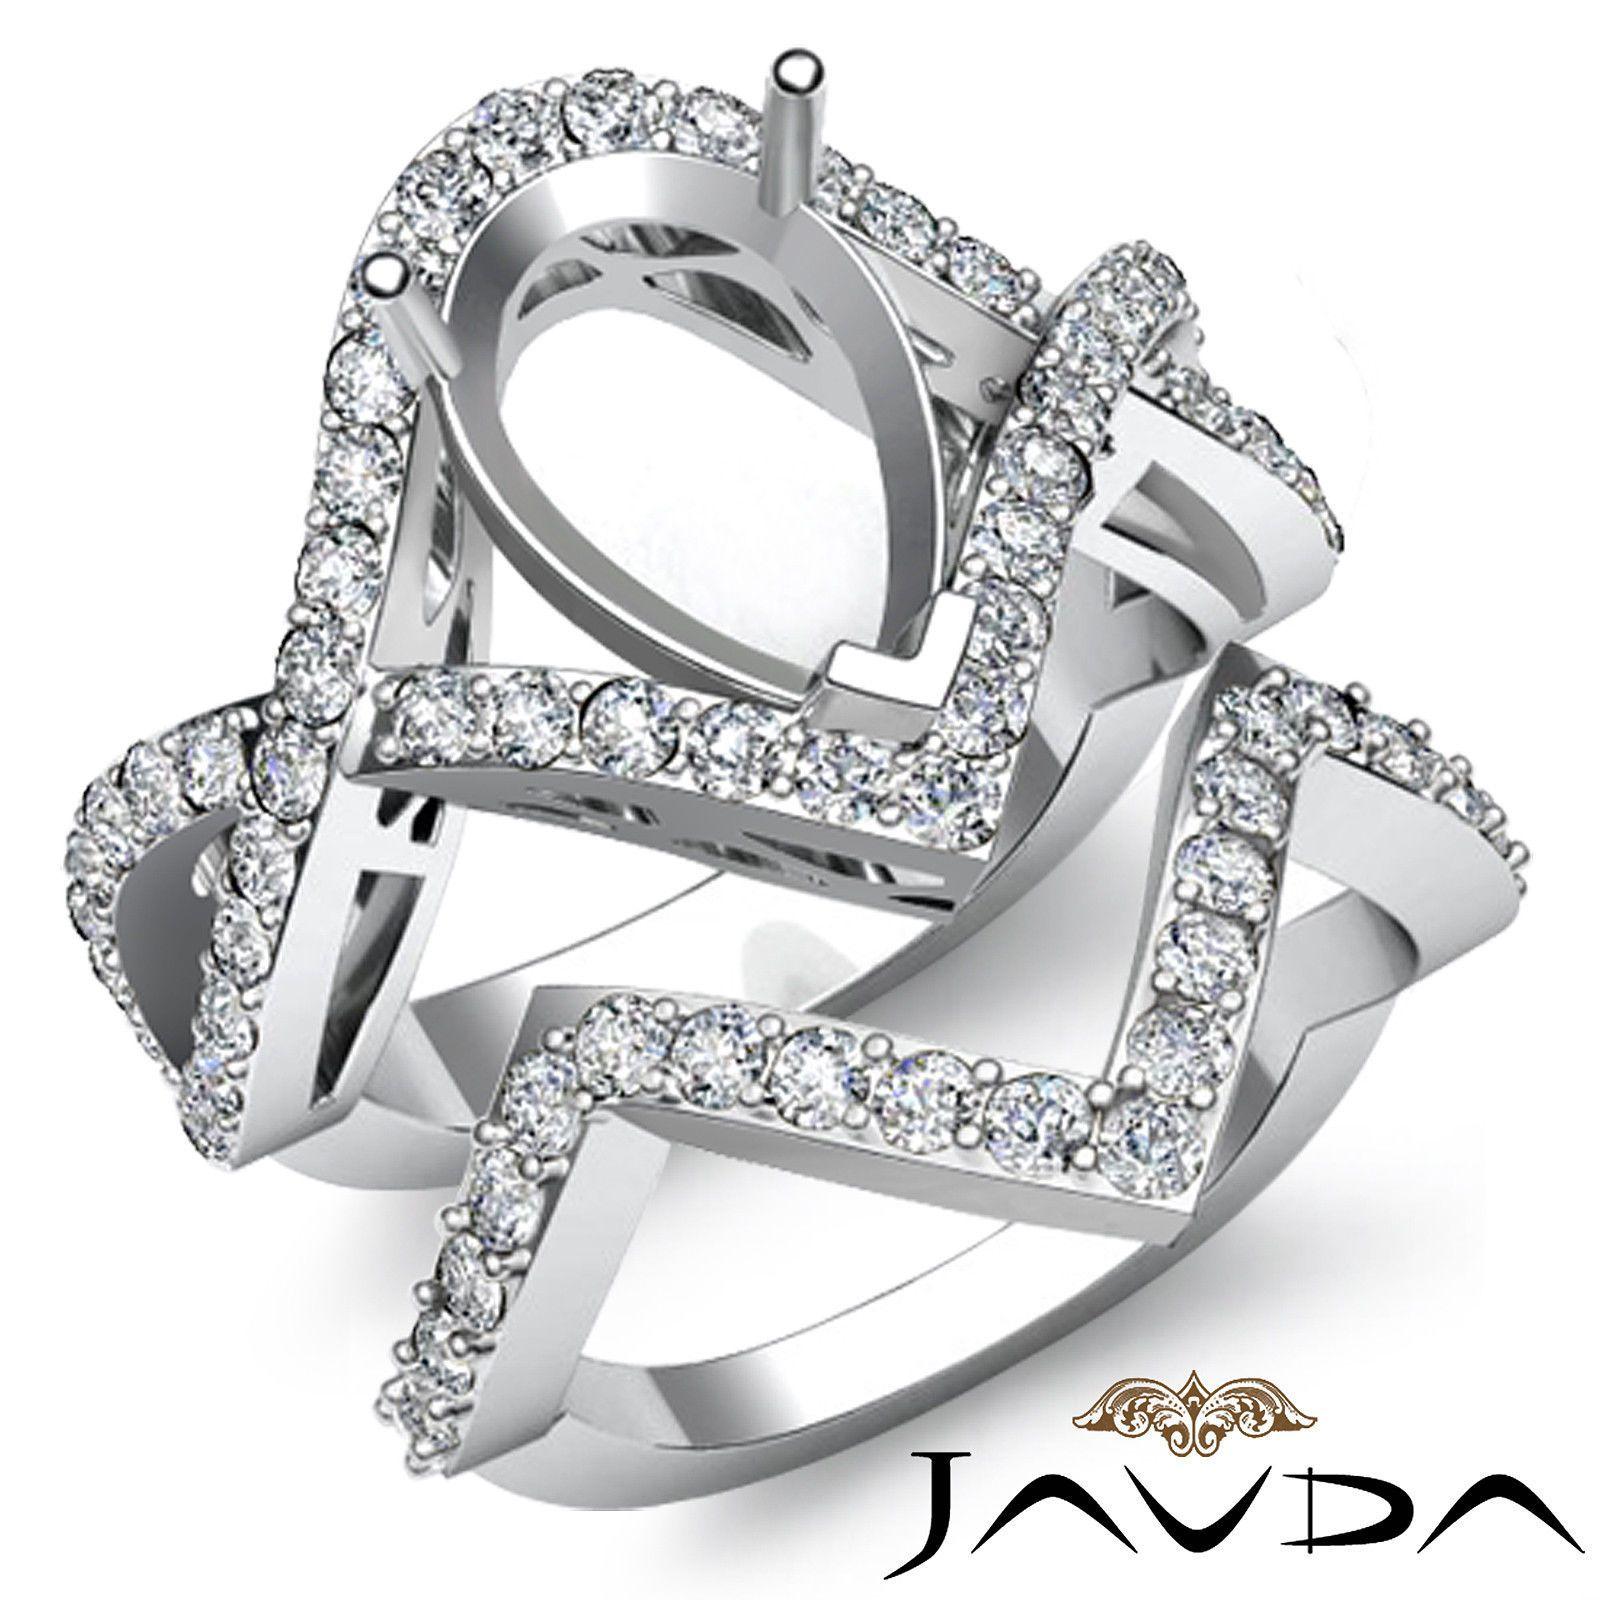 Round Diamond Engagement Ring Pear Bridal Set Platinum 950 Pave Setting 1 4ct | eBay